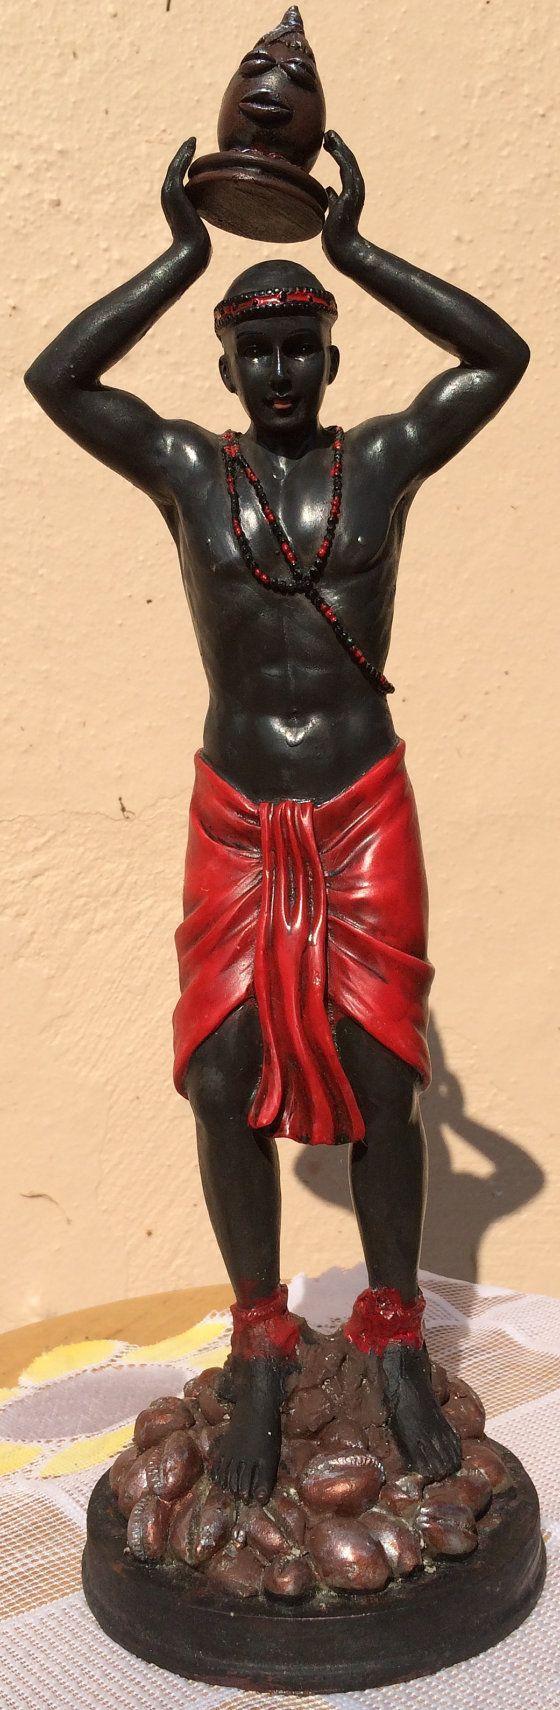 Orisha Eleggua Yoruba Religion Ellegua Catholic Religious Saint statues on Etsy, $37.00